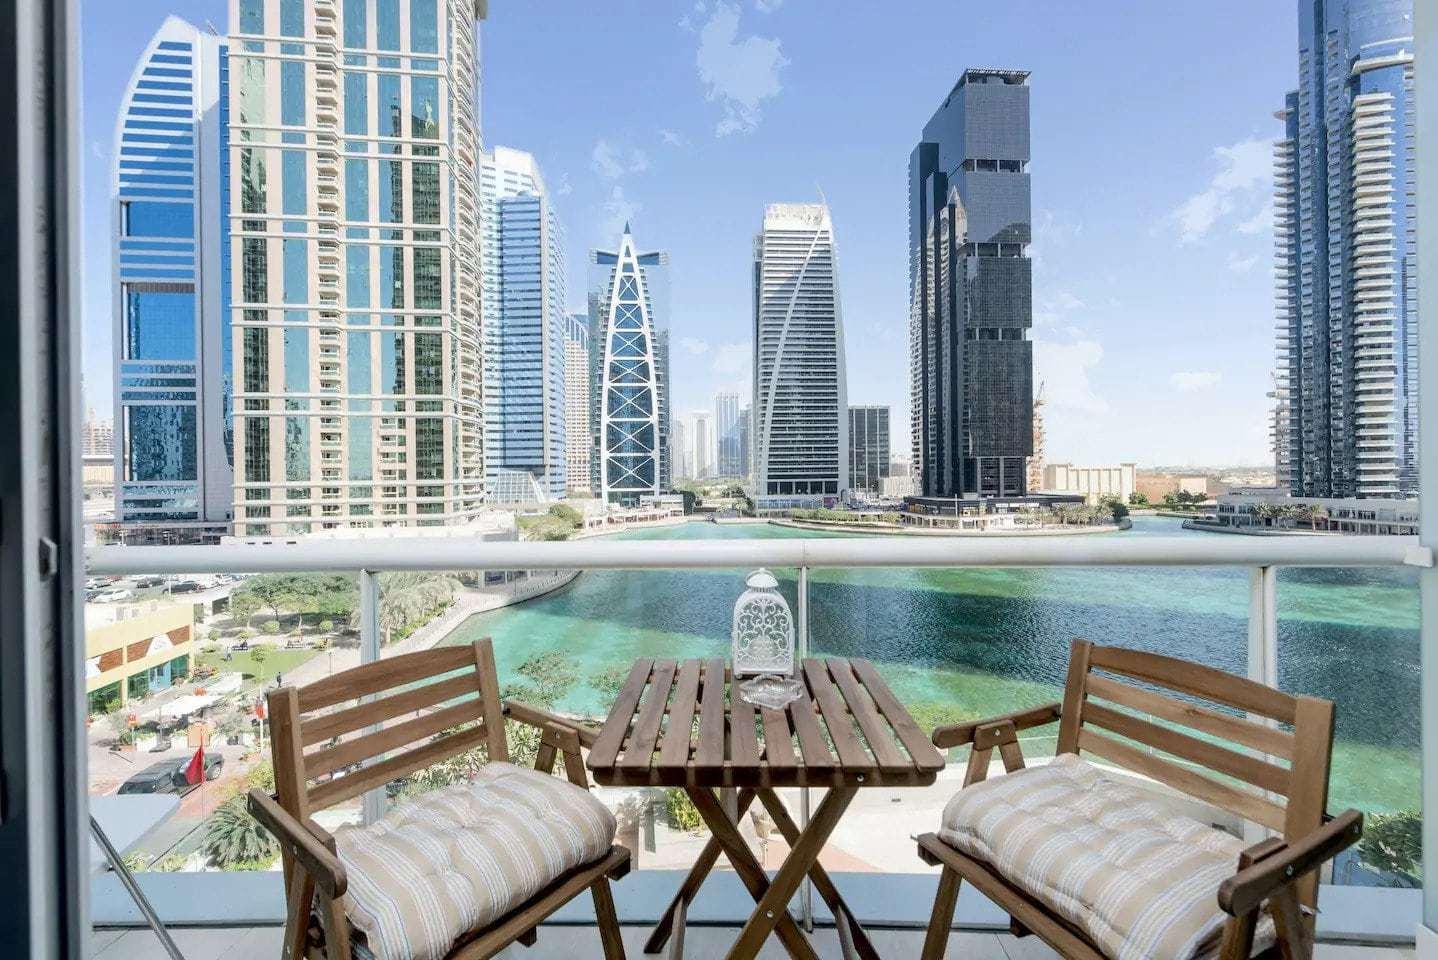 Dubai accommodation prices